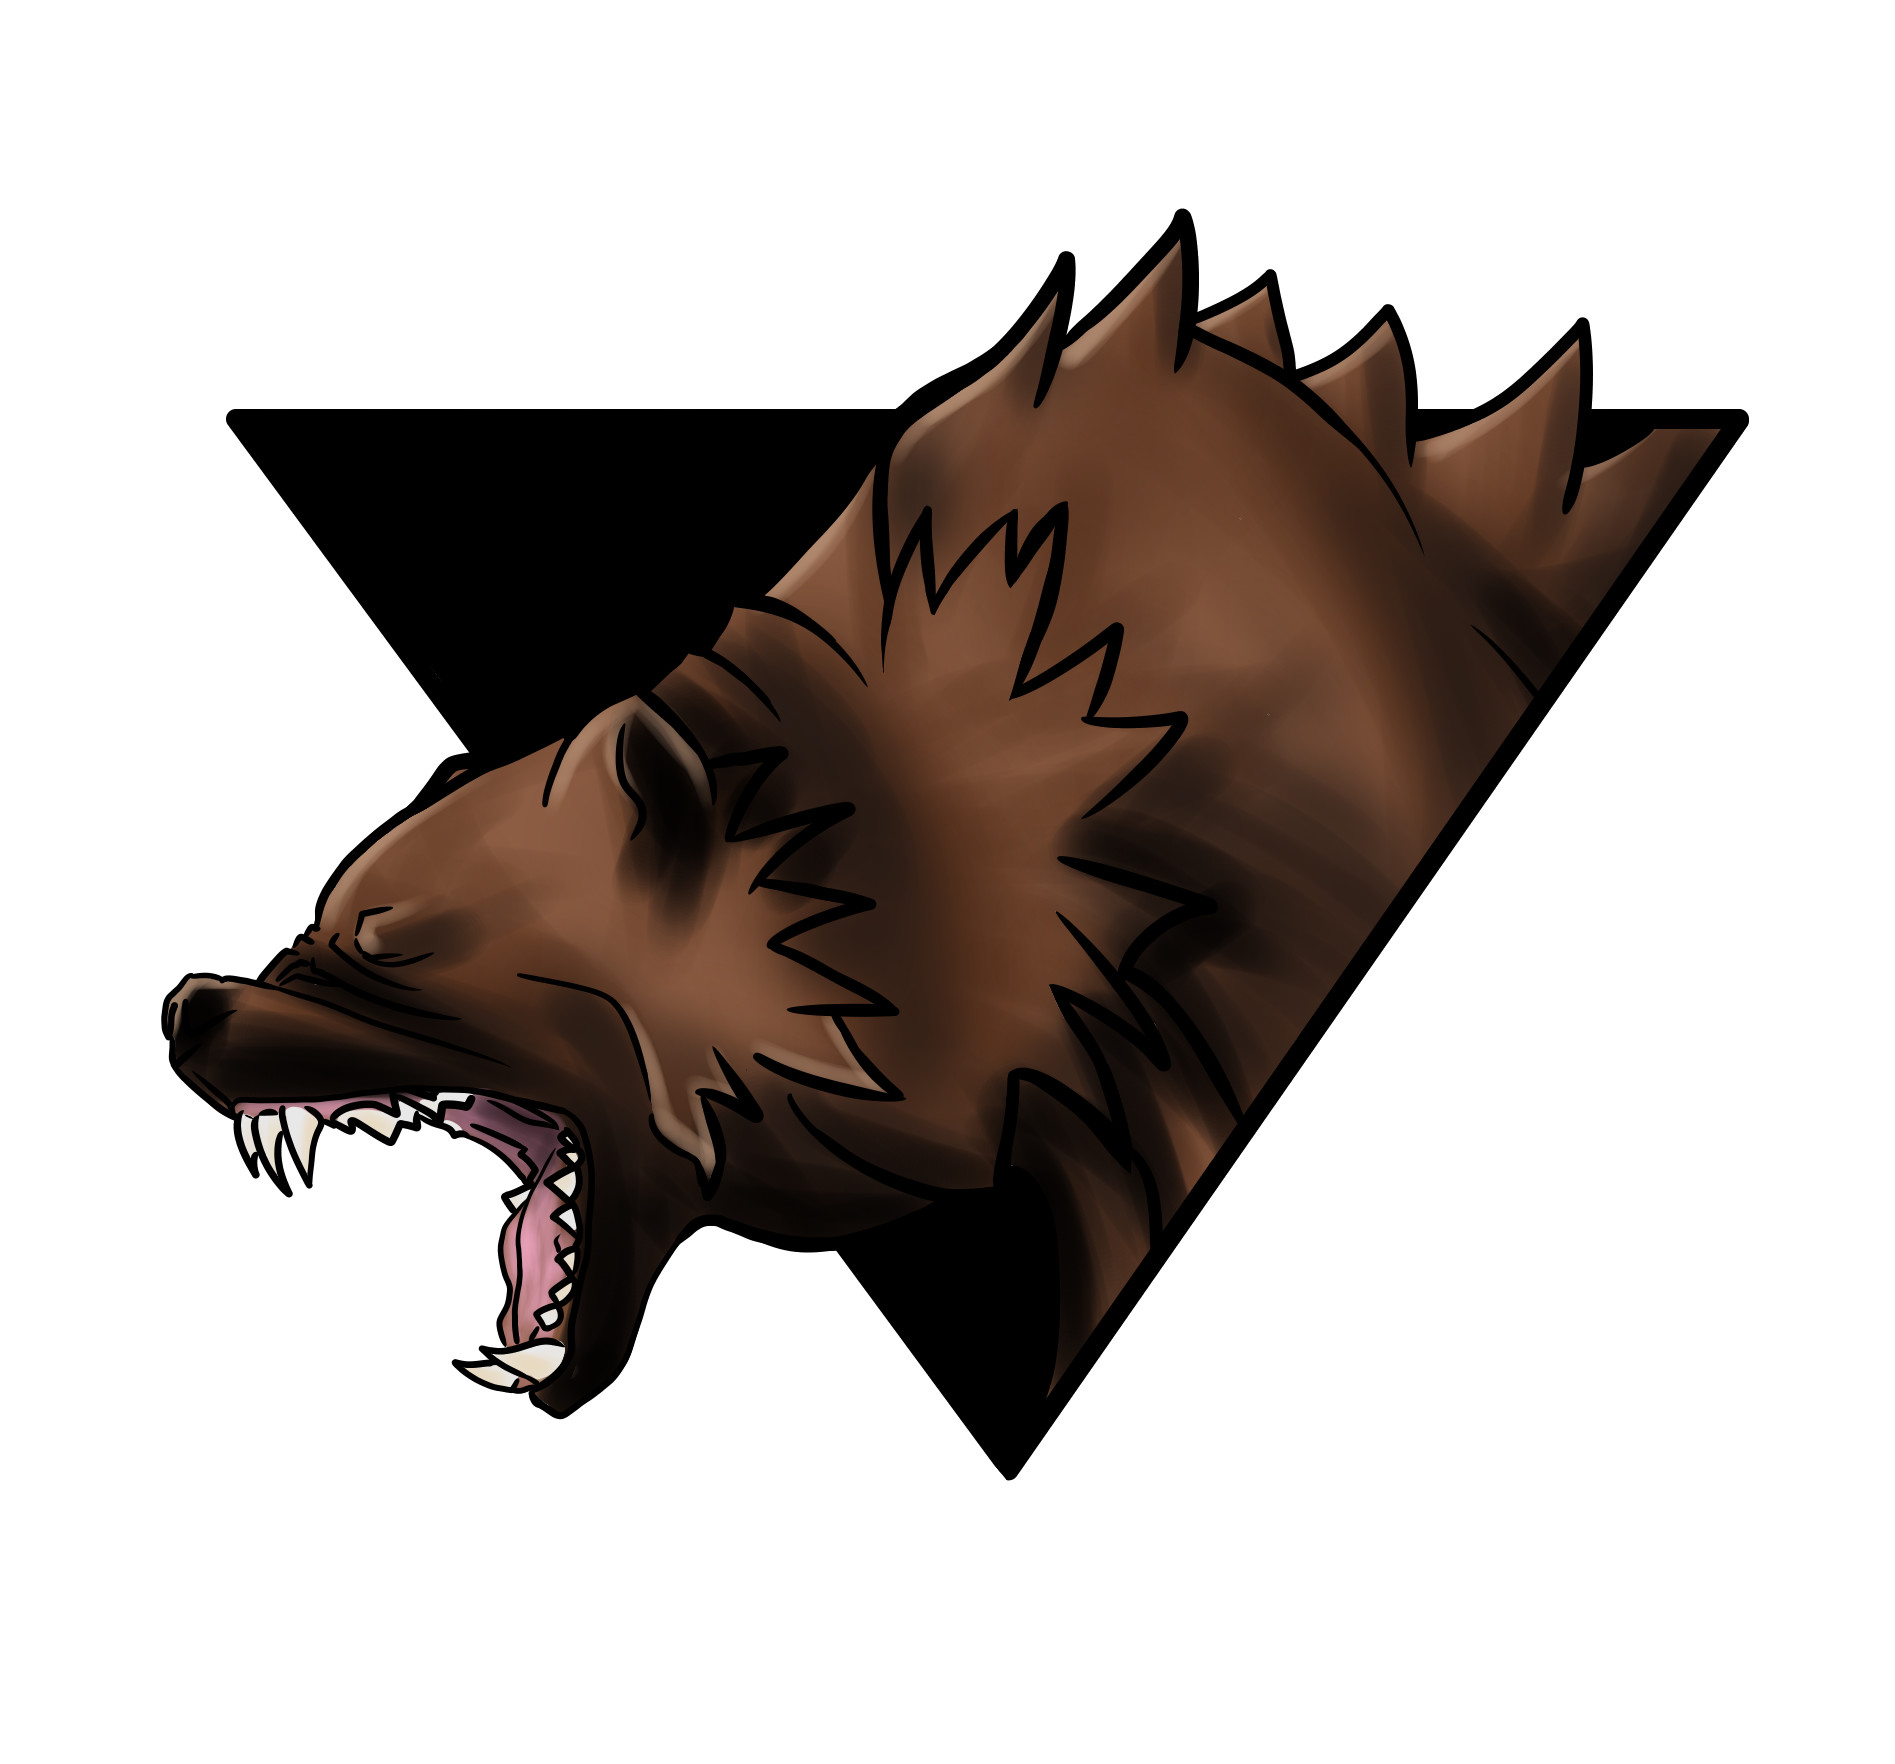 'Wolverine' yoyo model logo for company: Precise